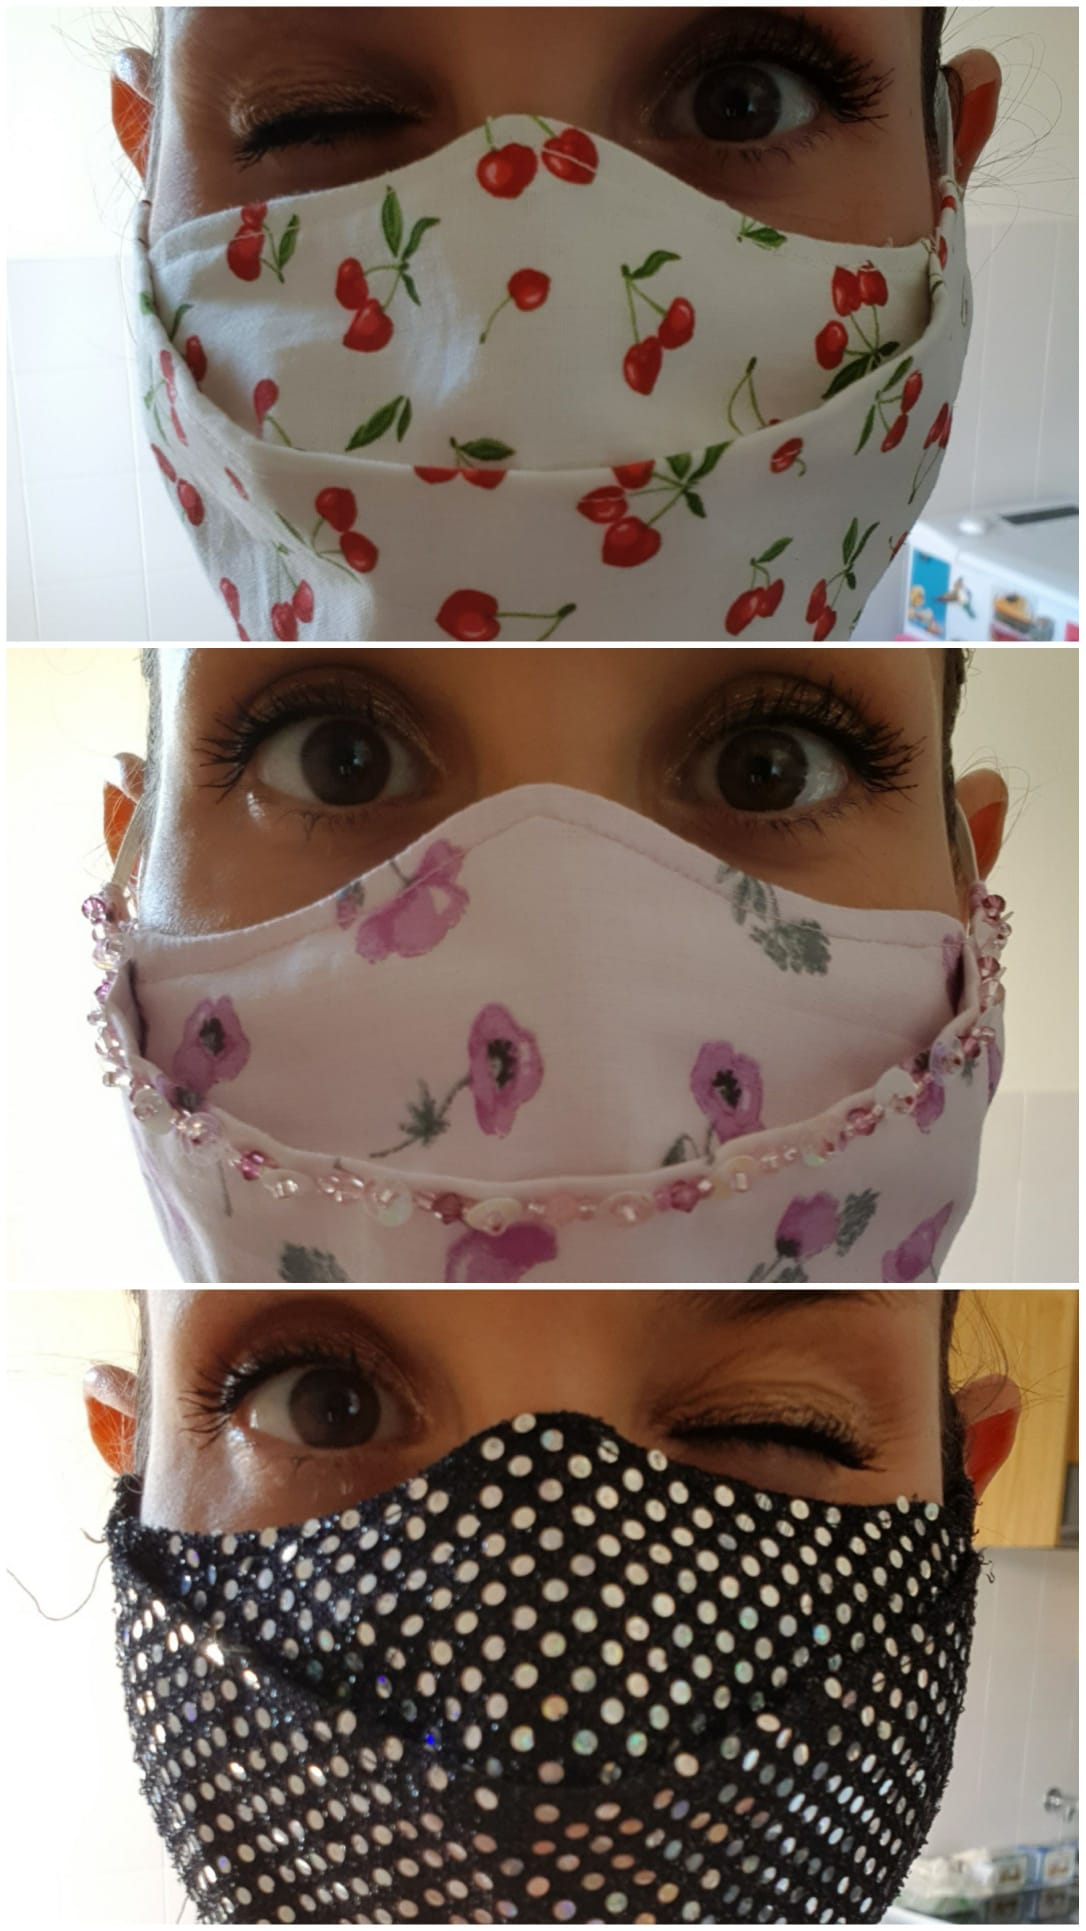 idees-id masques idelette genève createur